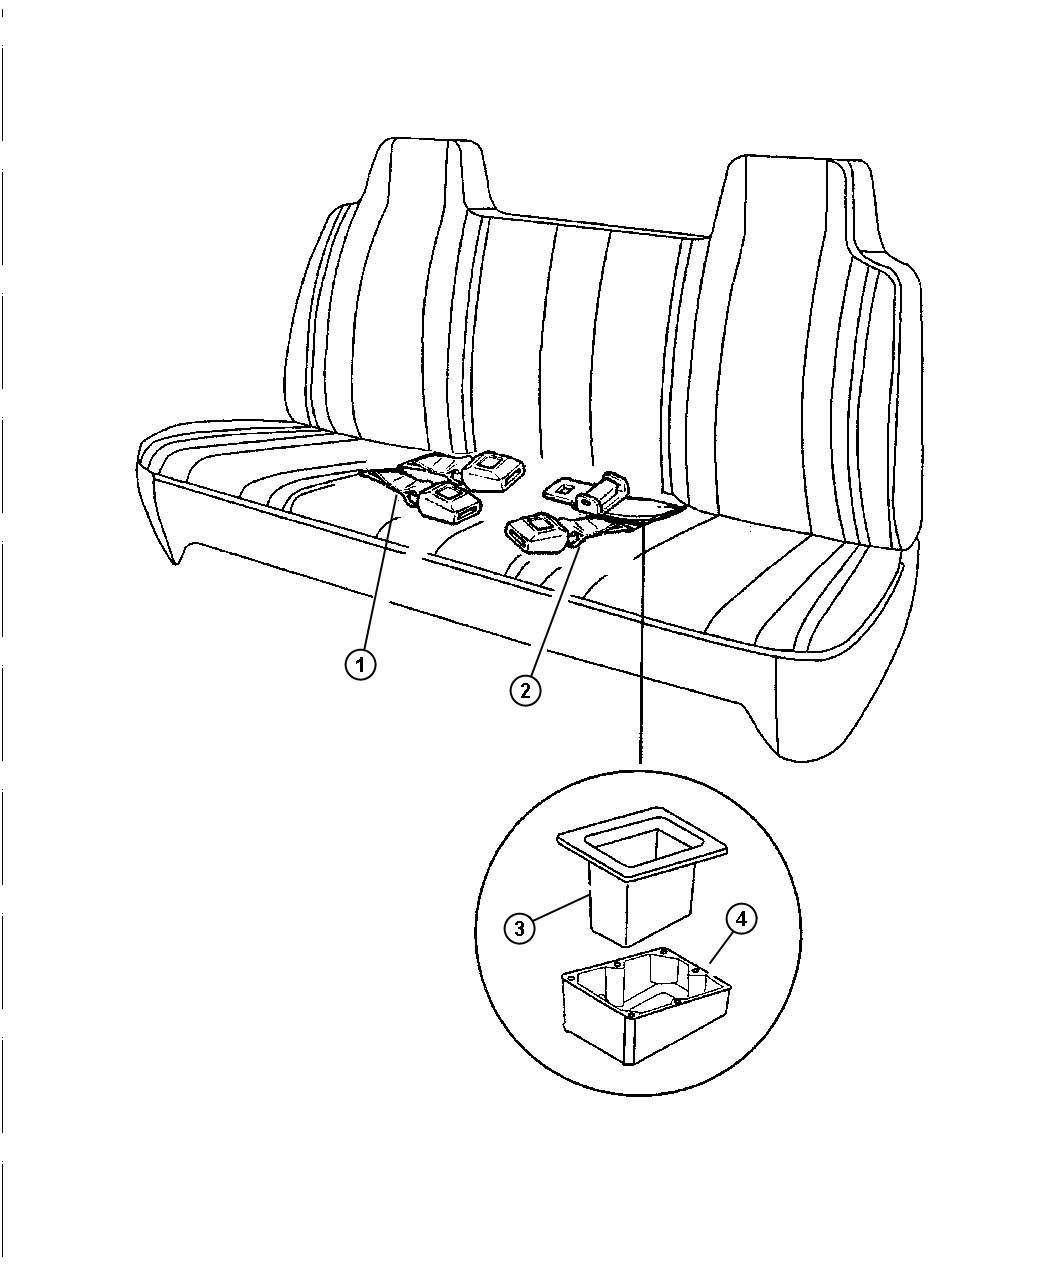 Jeep Grand Cherokee Lap Belt Seat Belt Two Buckles Used